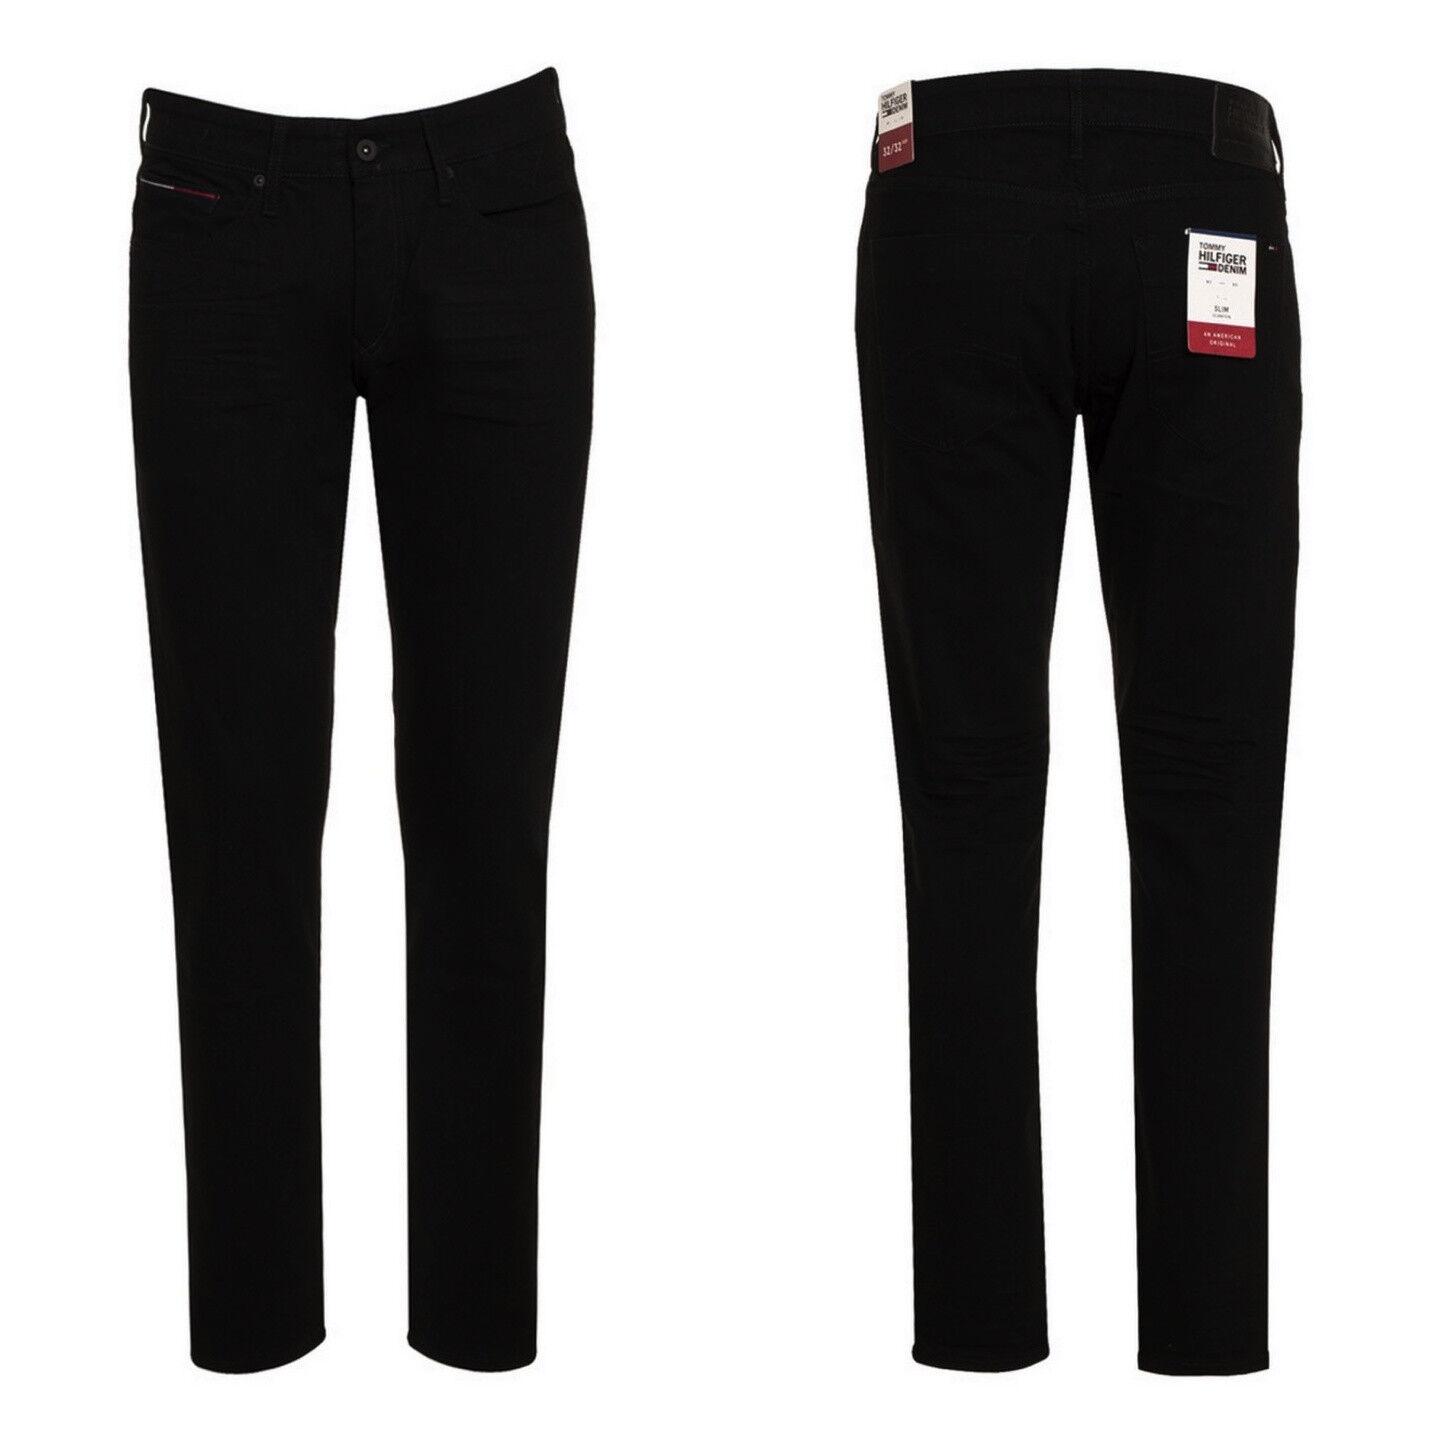 Tommy Hilfiger Herren Jeans  Scanton  Stretch    BLCO Slim Schwarz W31-32-34 L32 3e7d2e